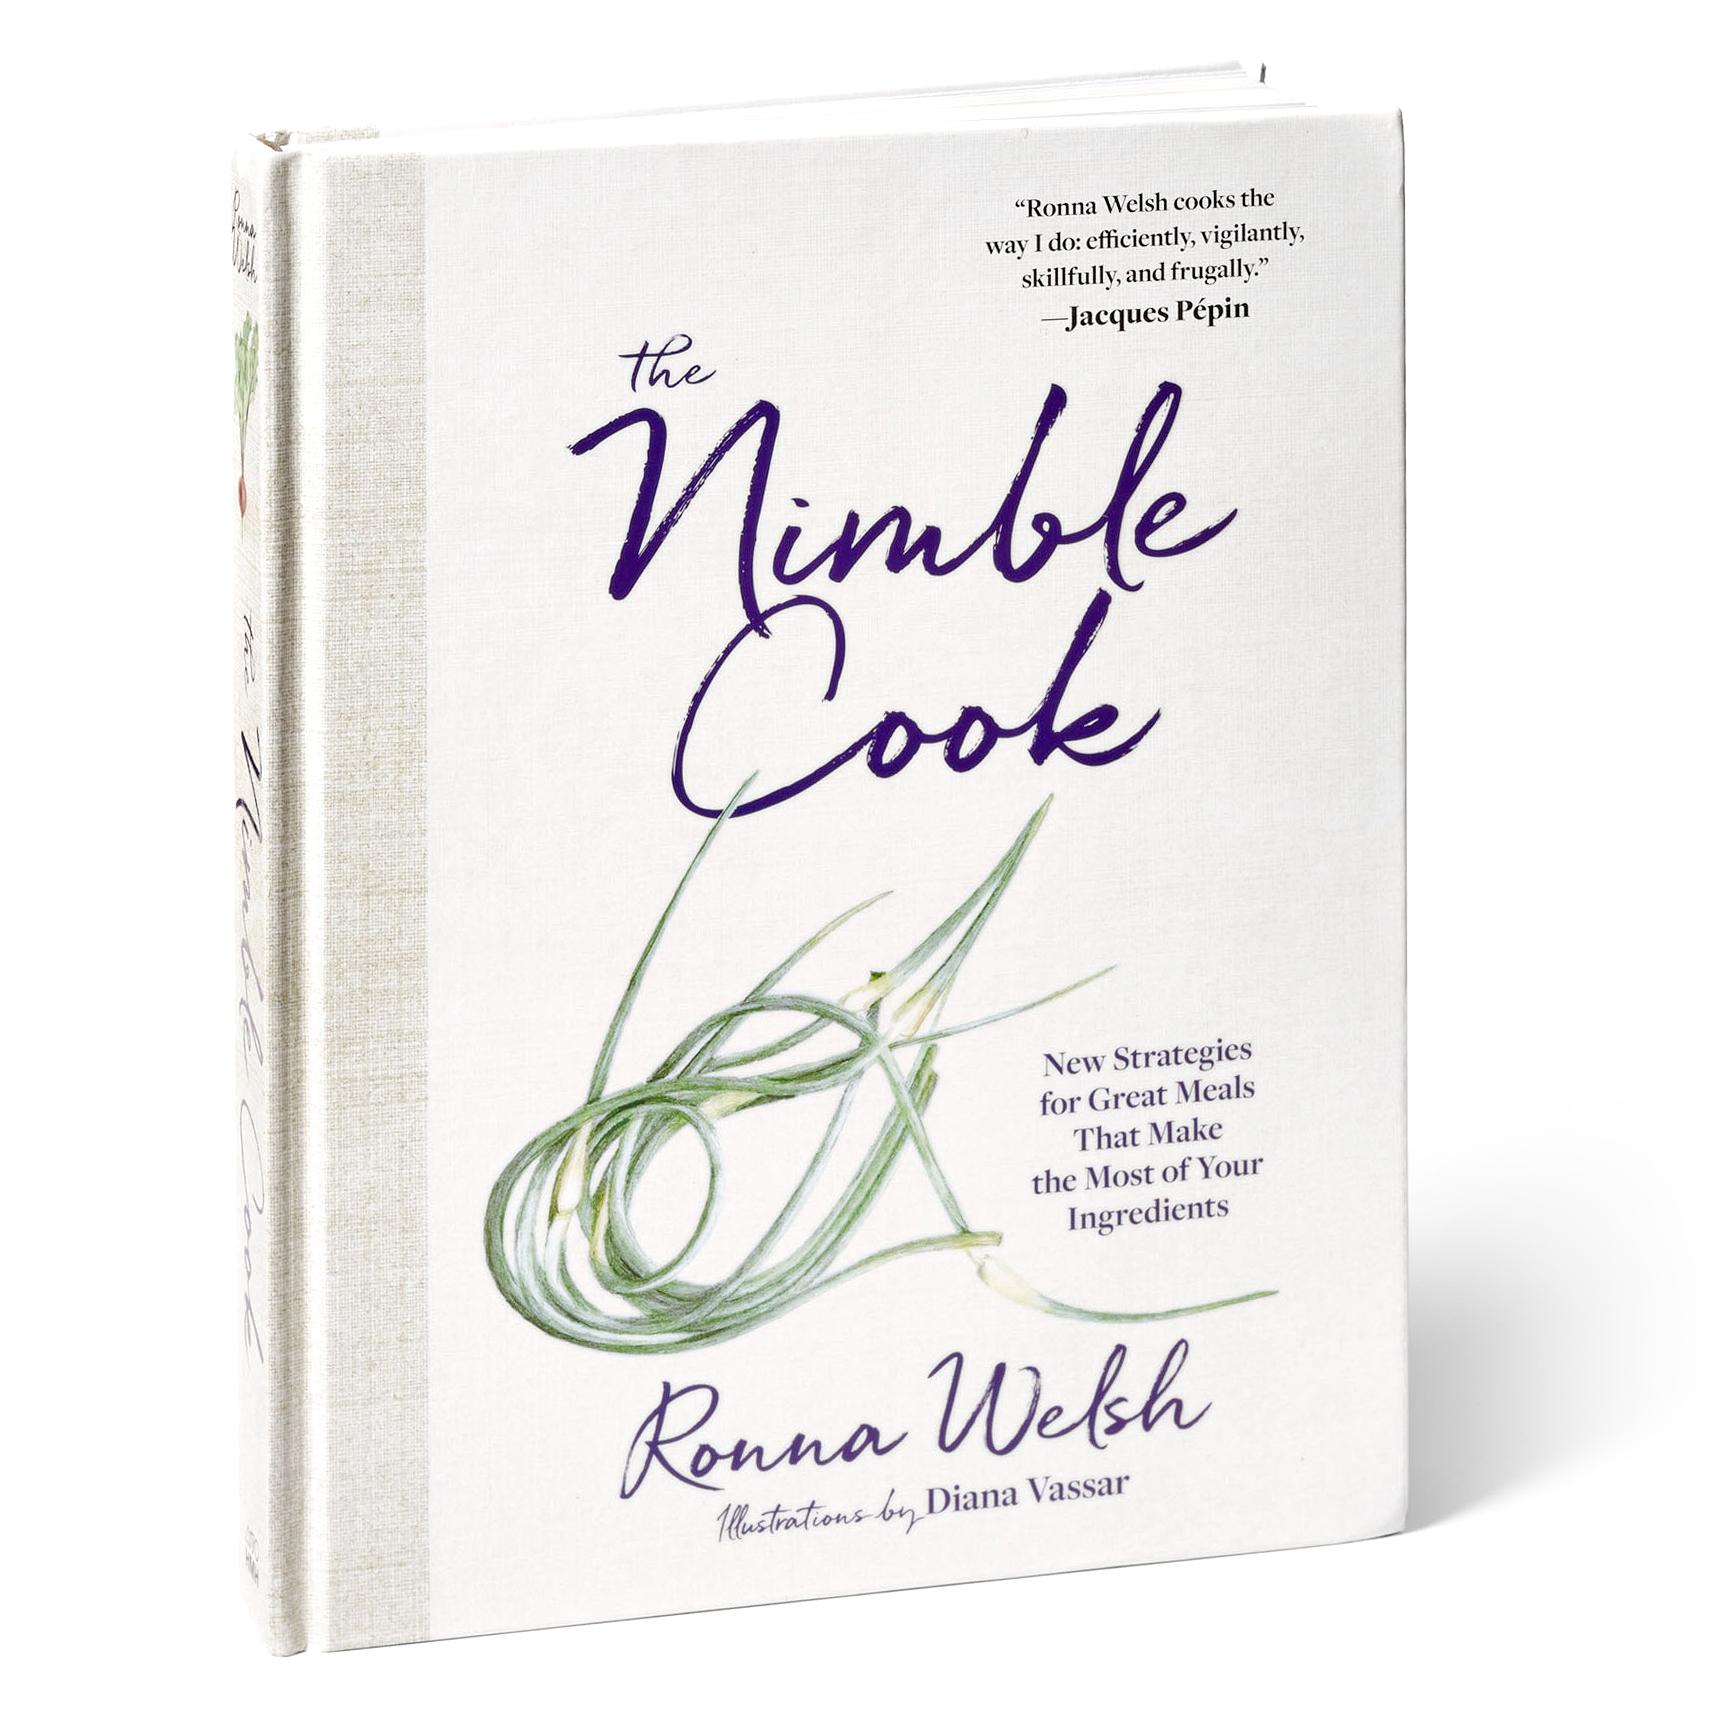 nimble-cook-cookbook-cover-8503b440